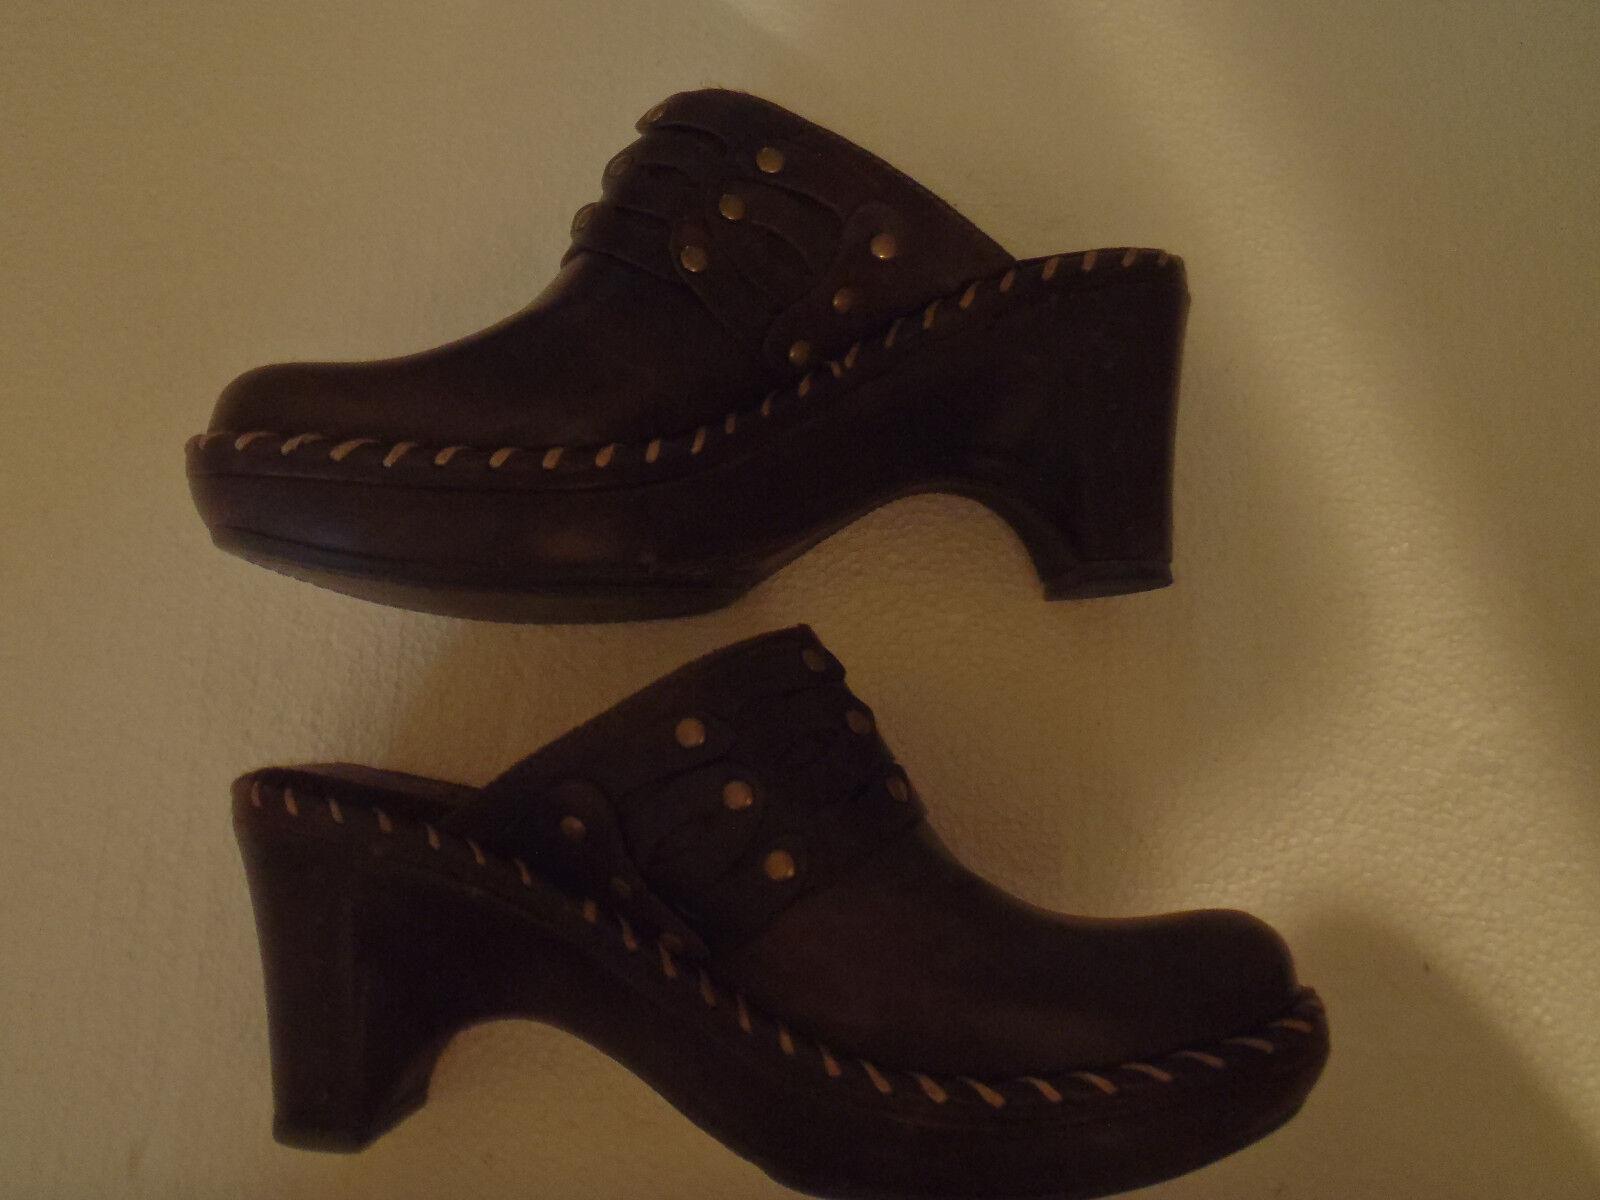 Frye Wedges Clogs Heels Dark Brown Leather Tanned 70850 Slides Slides Slides Mules 5.5M 7dcb8c